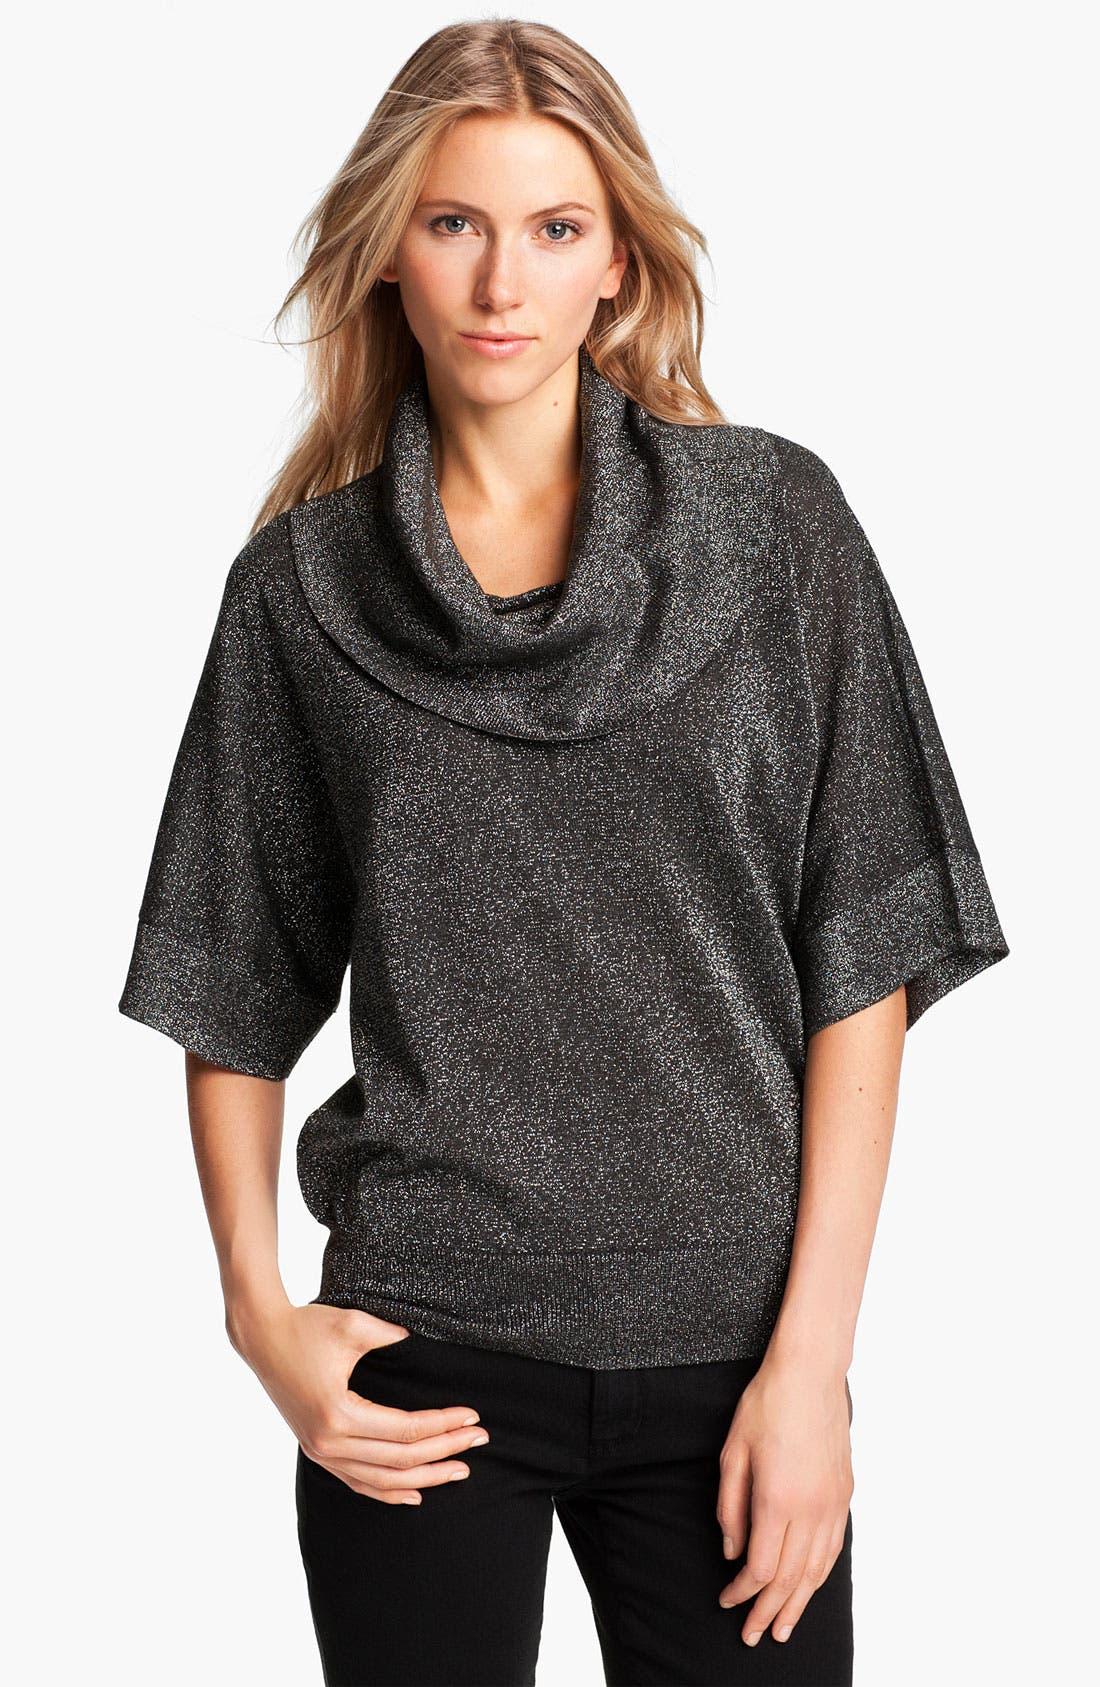 Alternate Image 1 Selected - MICHAEL Michael Kors Metallic Knit Sweater